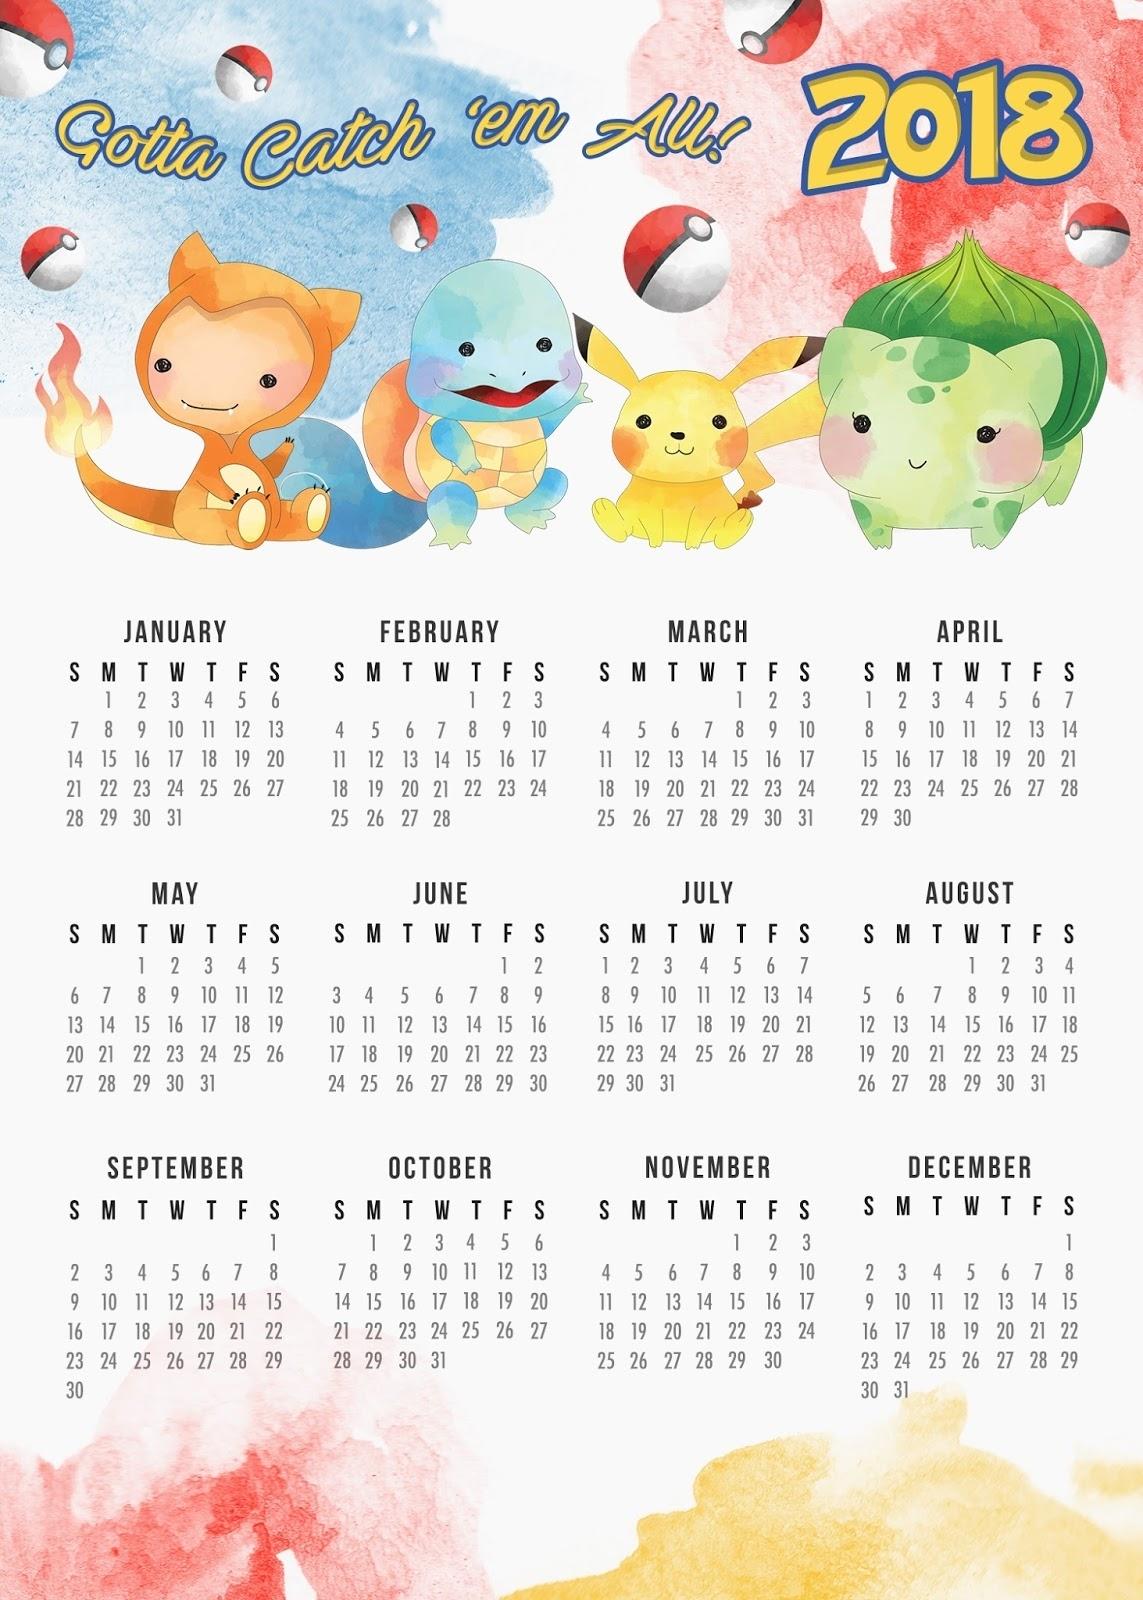 Free Printable 2018 Pokemon Calendar. - Oh My Fiesta! For Geeks with regard to Free Printable Adult Superhero Calendars